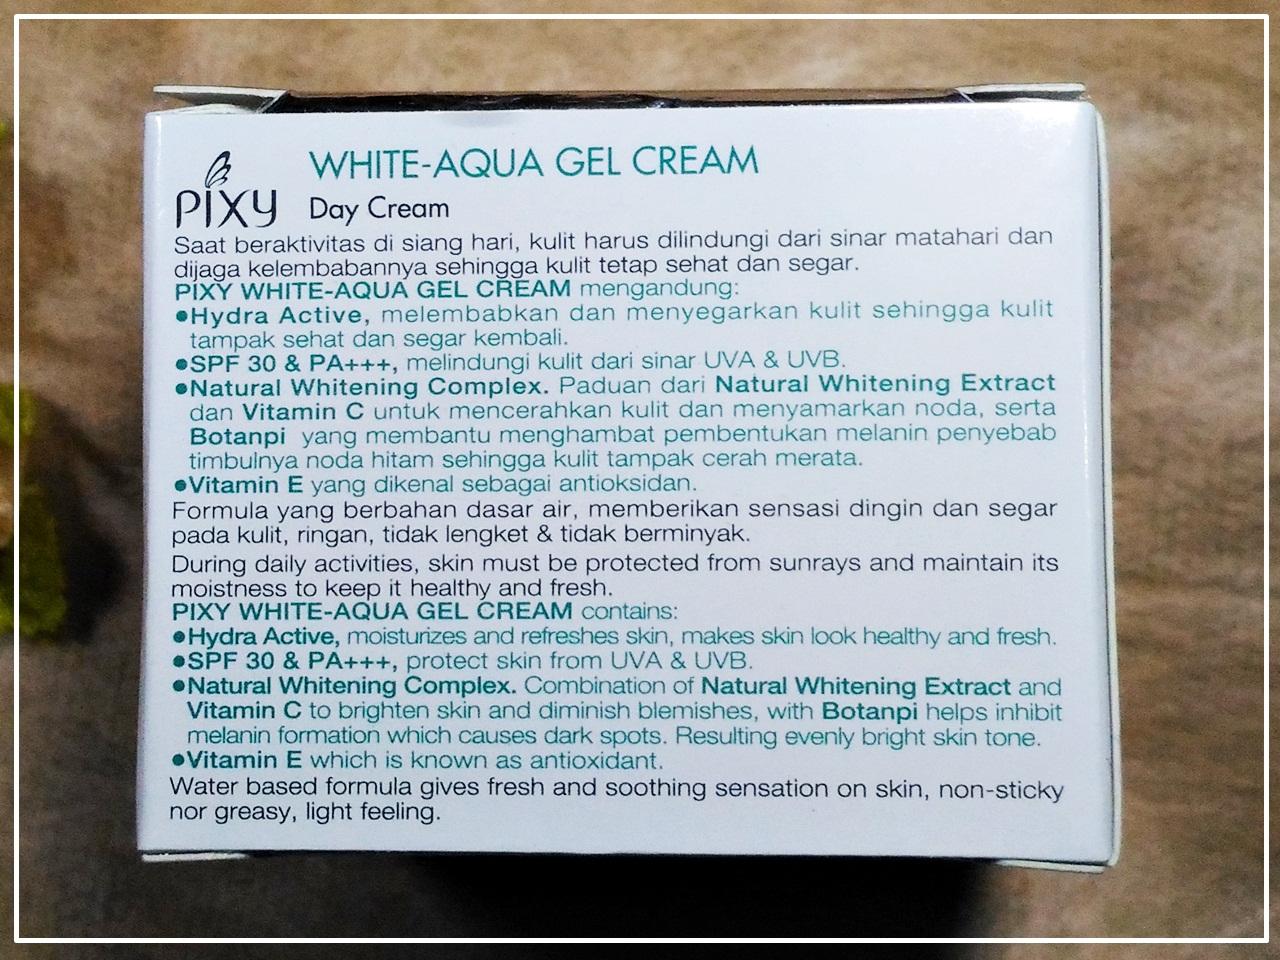 Review Pixy White Aqua Gel Cream - Day Cream ~ Pejalan Kaki